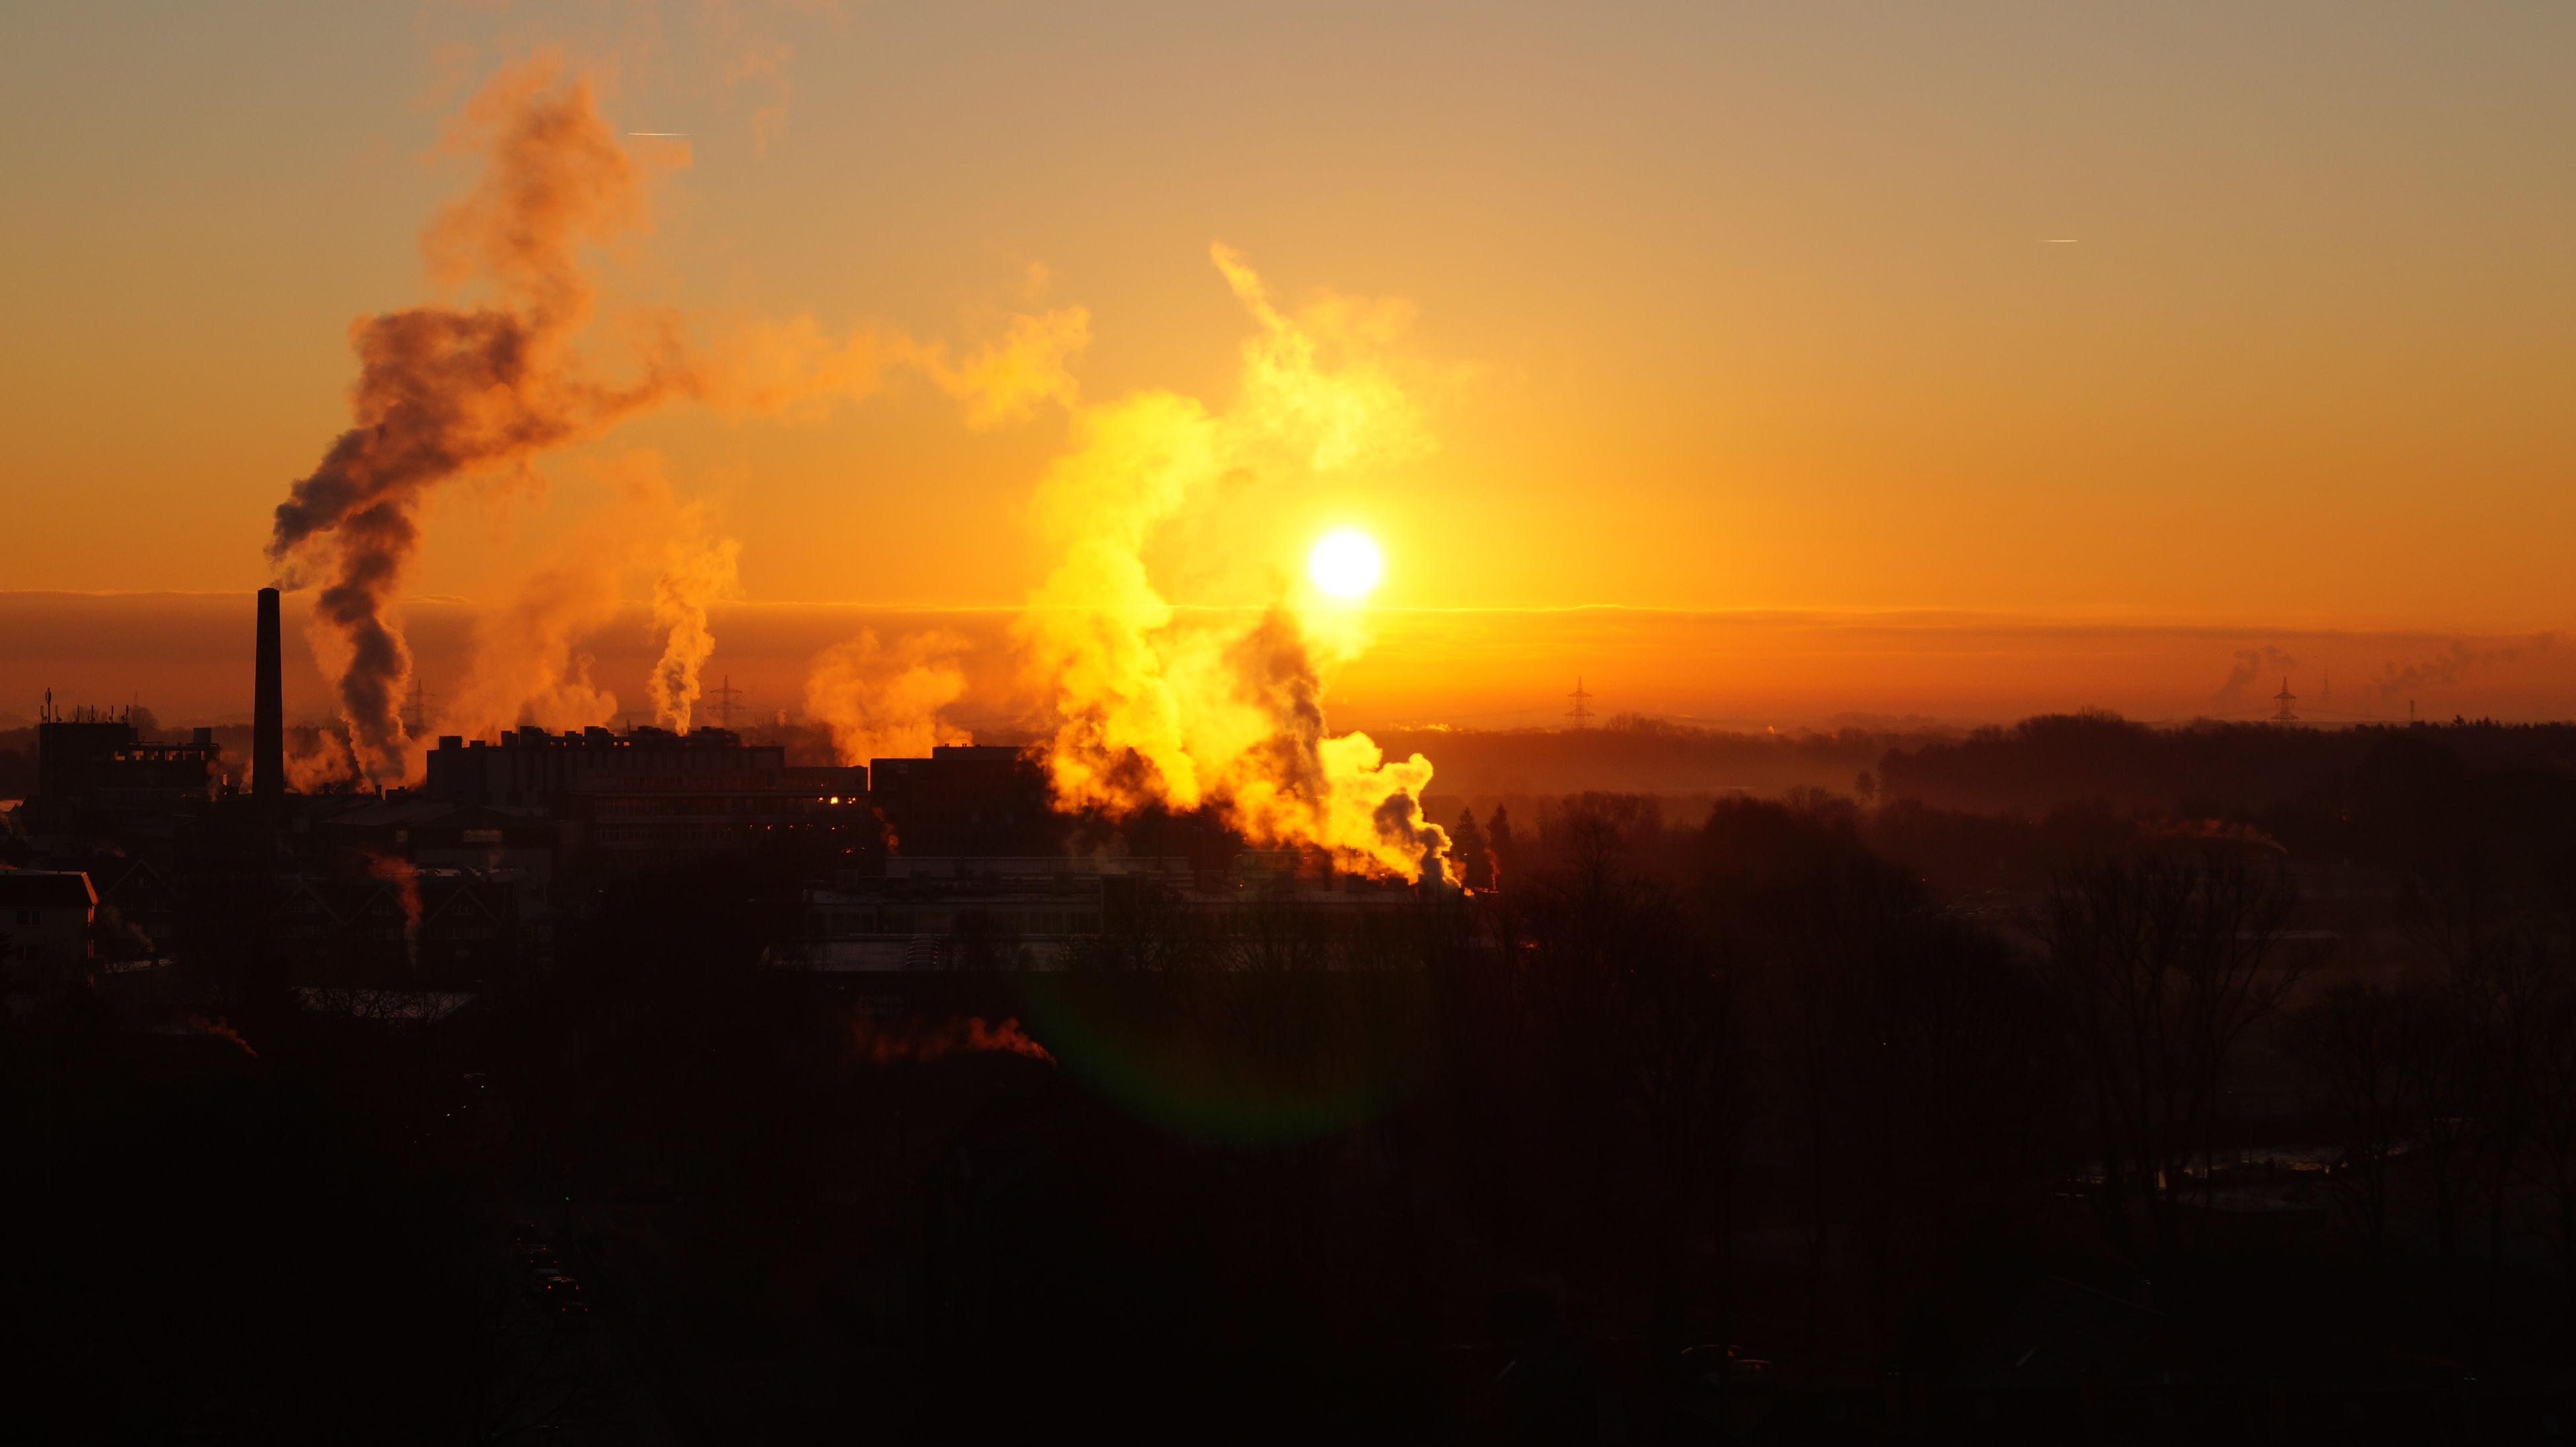 sunset, orange color, sky, silhouette, building exterior, landscape, scenics, cloud - sky, built structure, architecture, beauty in nature, nature, city, sun, outdoors, tranquil scene, cityscape, dusk, no people, idyllic